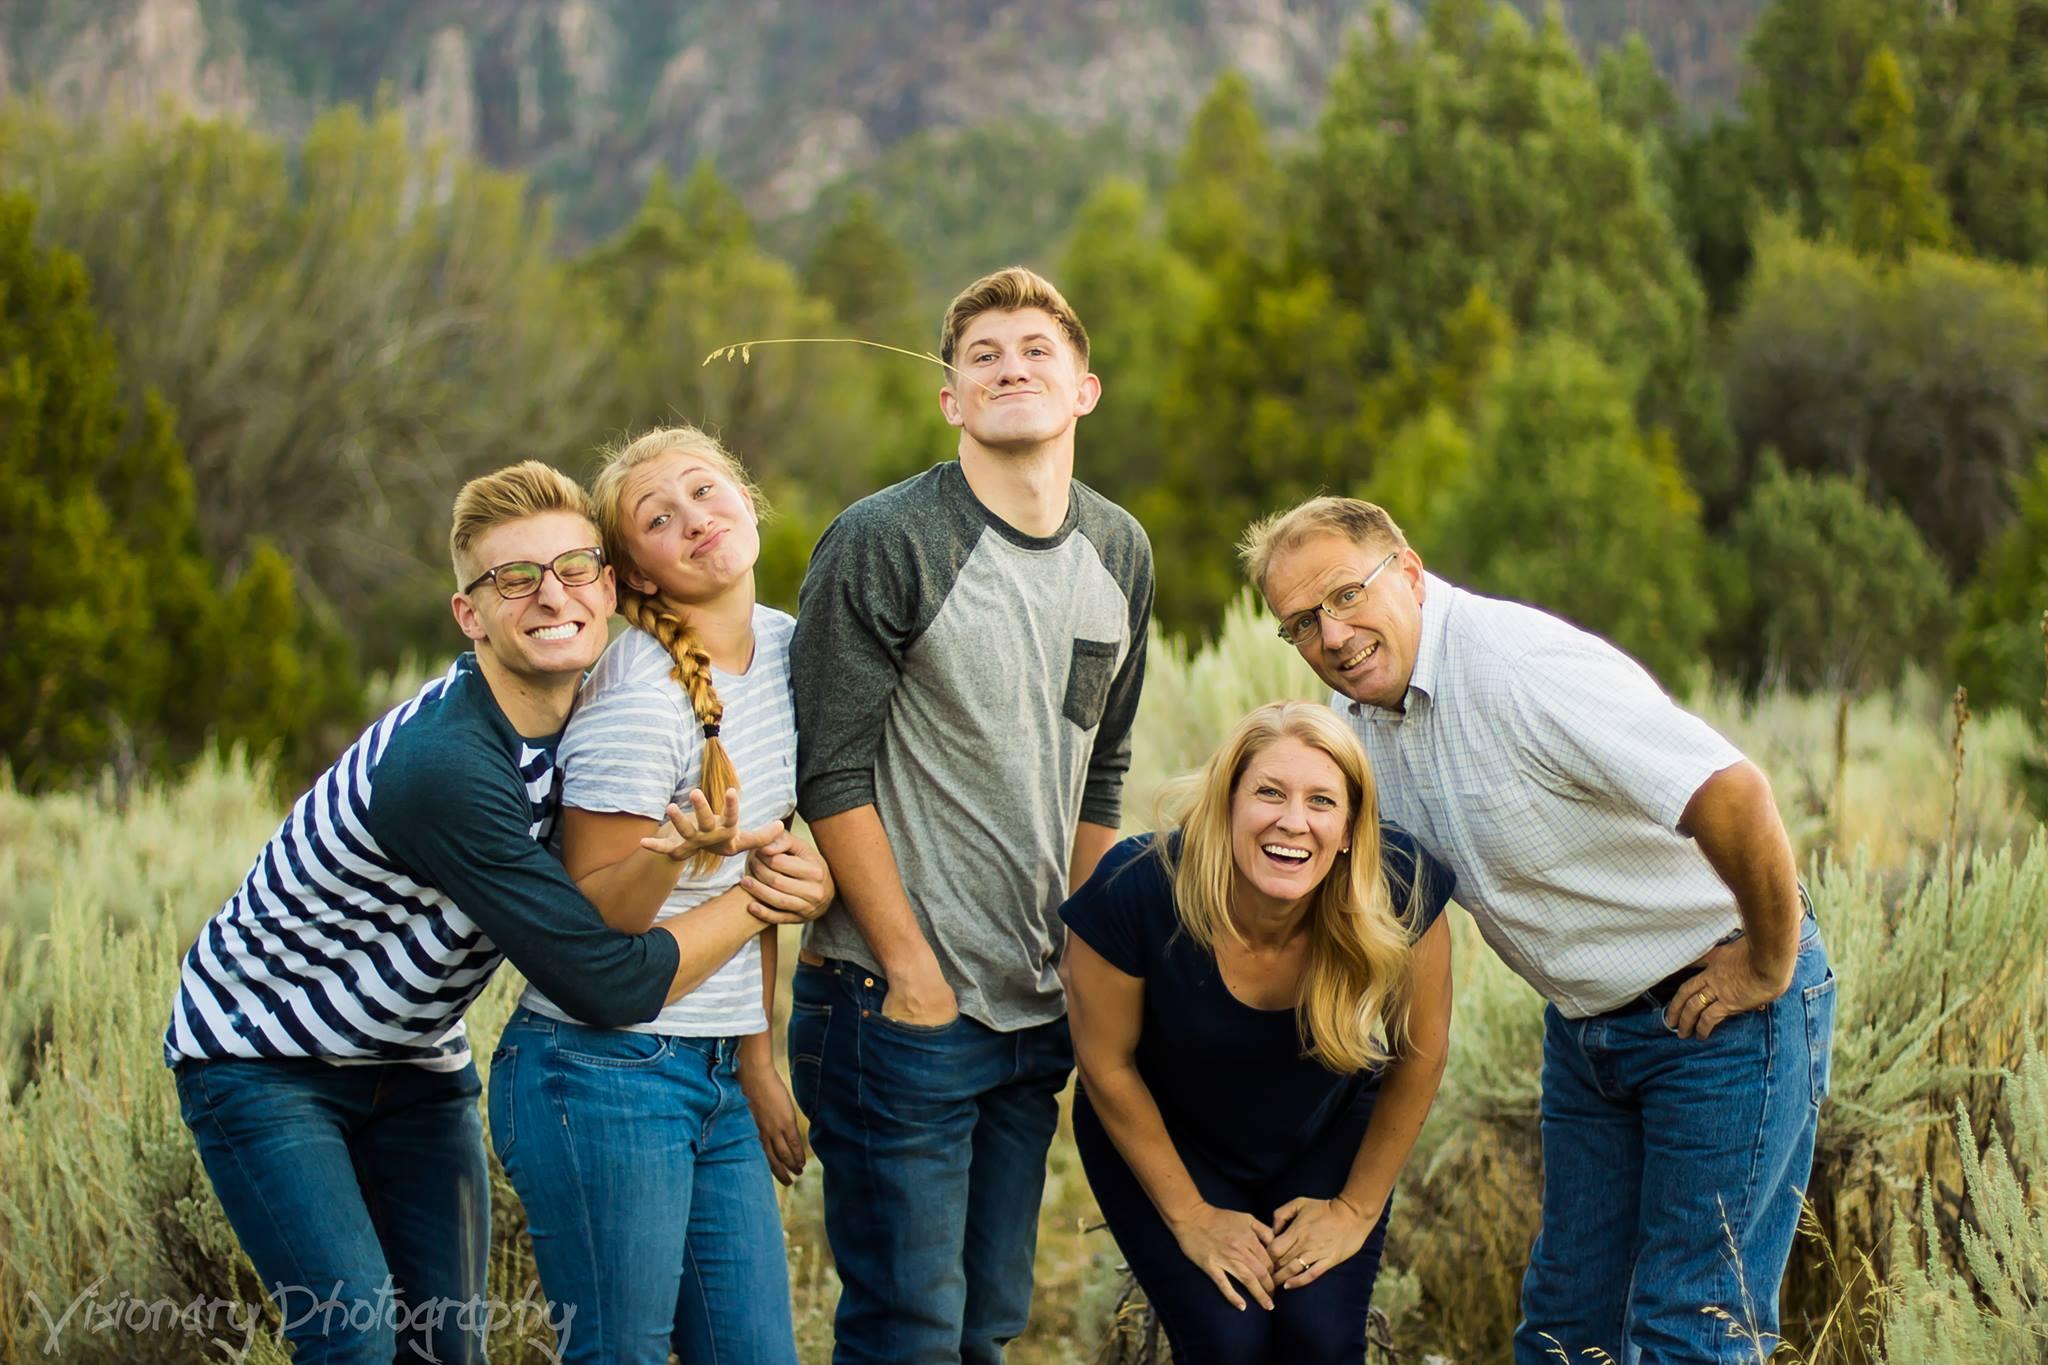 Kelsch Construction Owner Builder Mentor family Pic